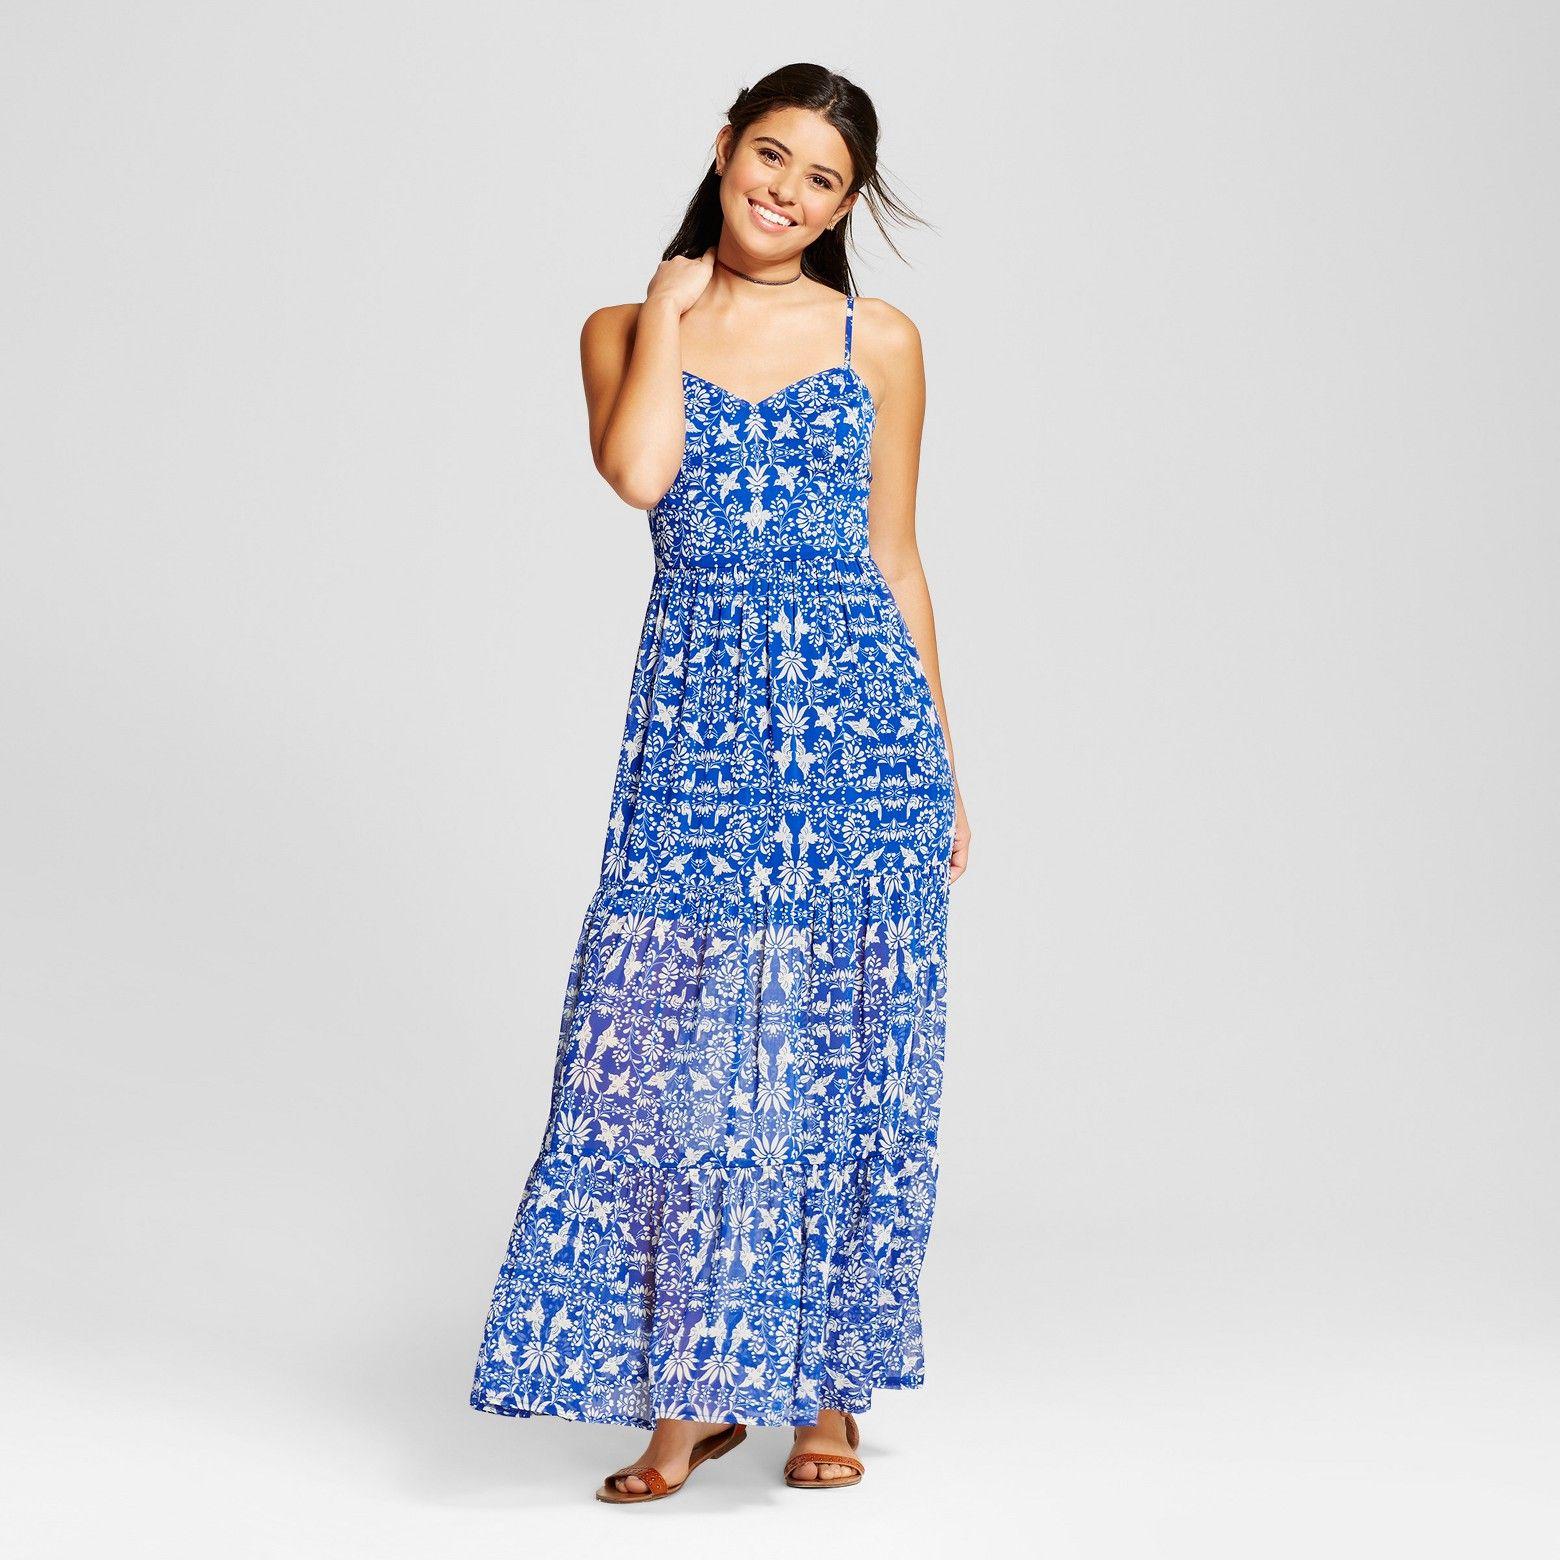 3db9da37d Women's Floral Maxi Dress - Xhilaration™ (Juniors') Royal Blue ...